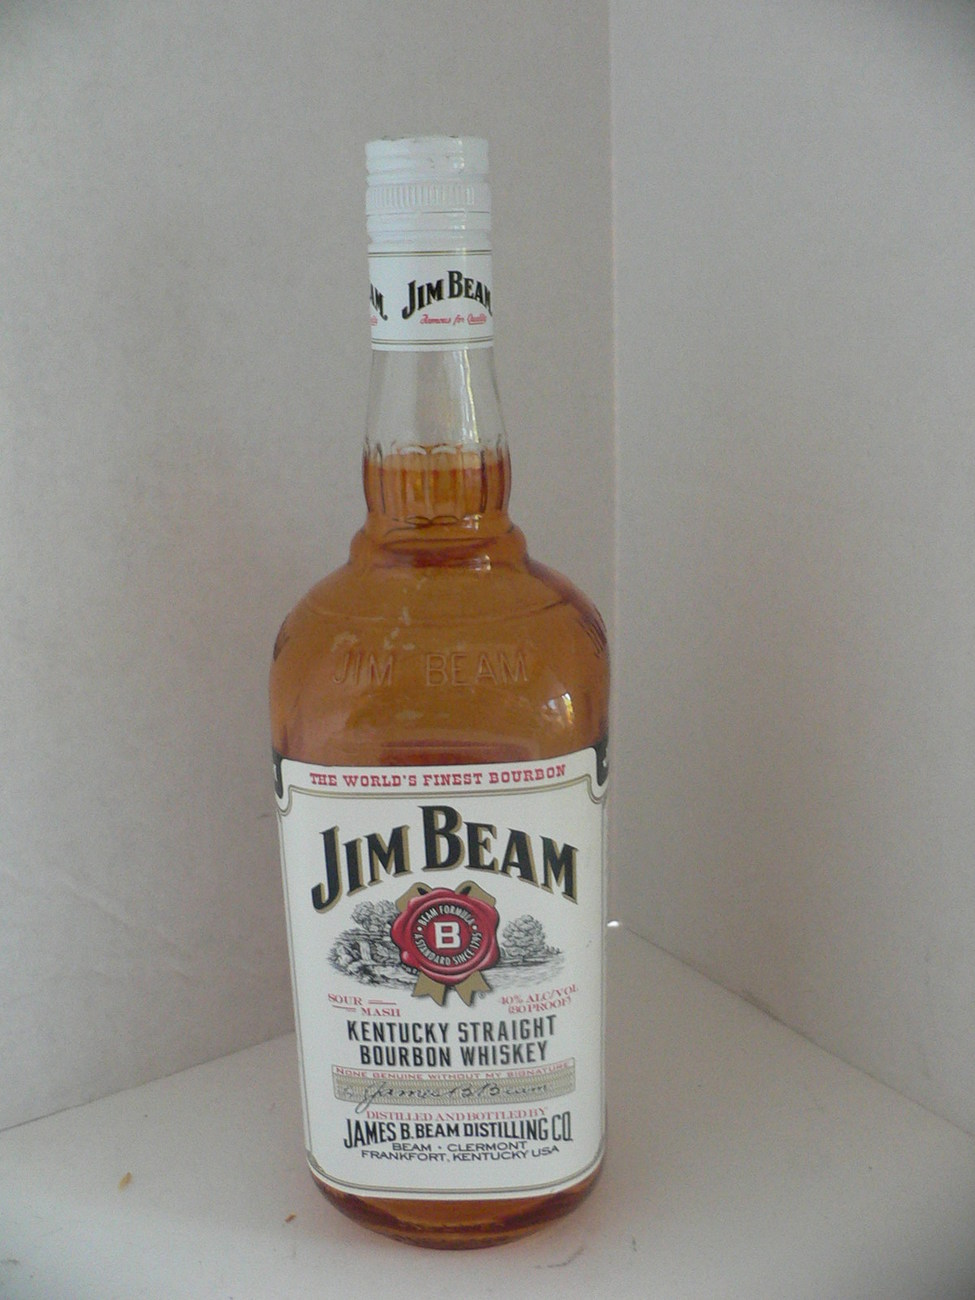 5 Jim Beam 1 Liter Bottle Unopened Empty Amber Colored